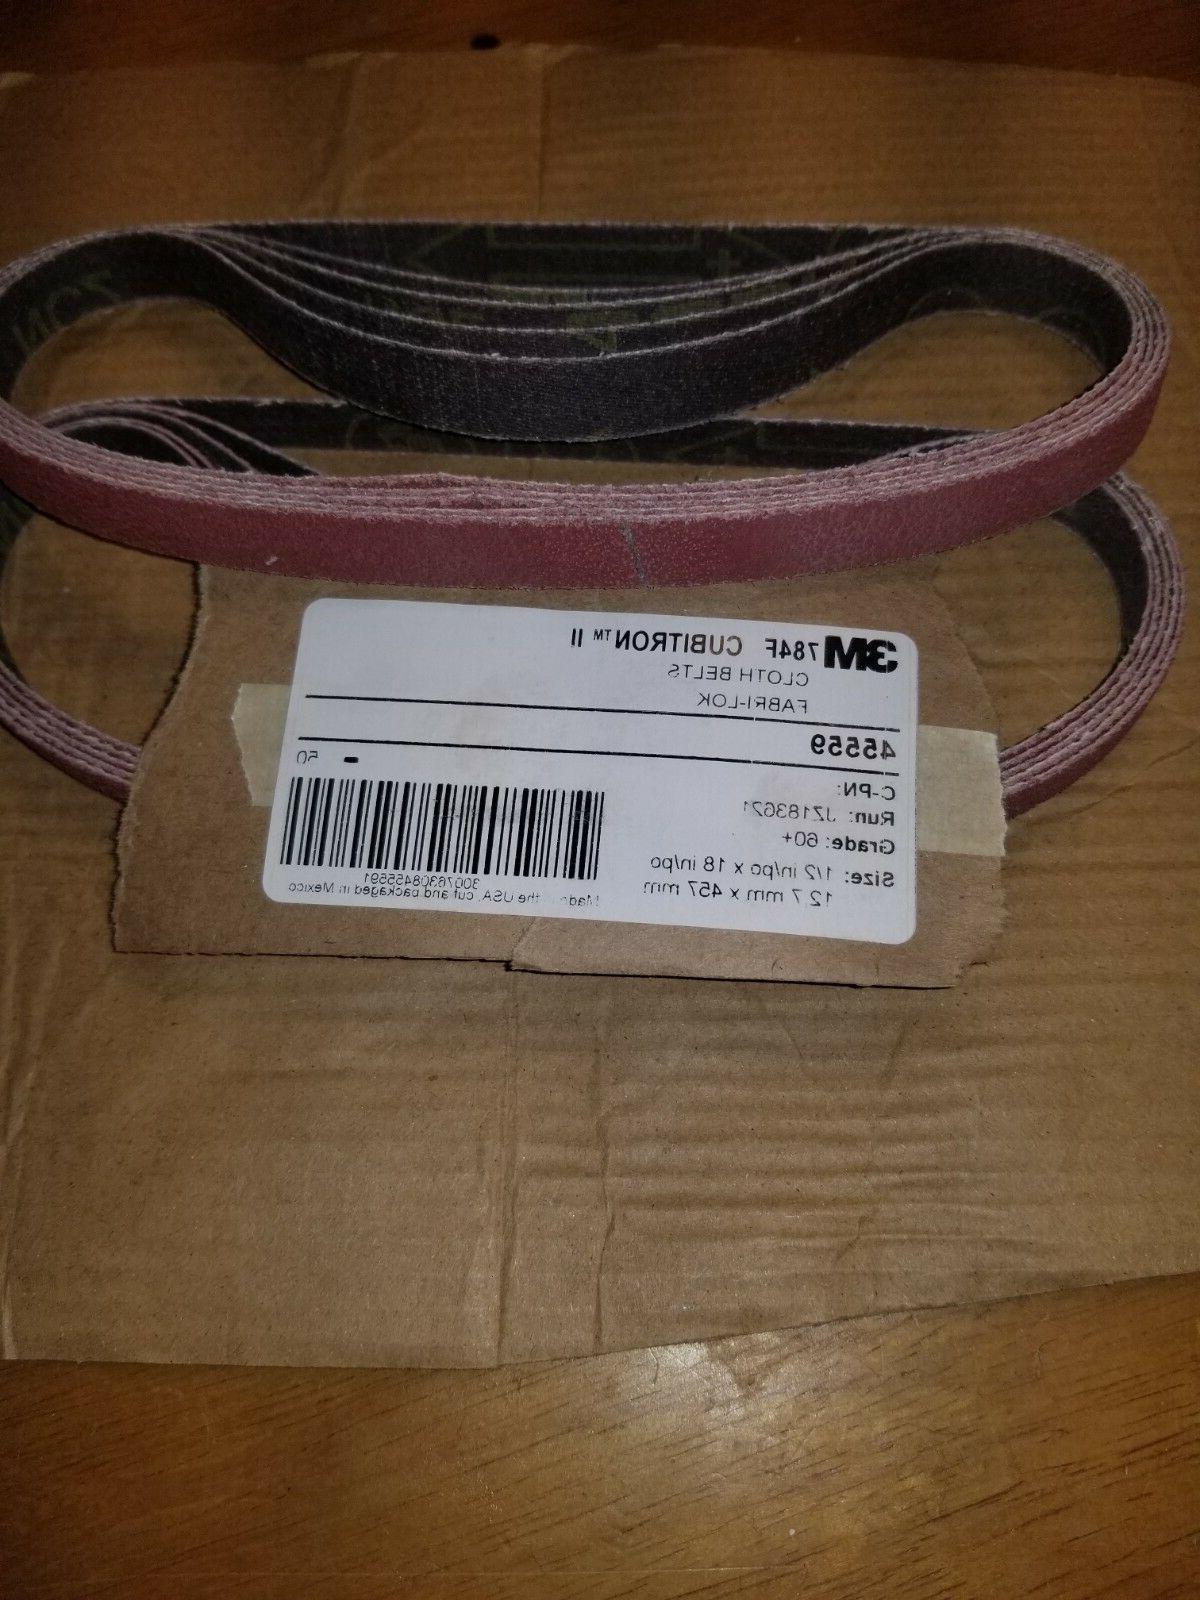 3M cubitron II cloth belts grit 60+ 1/2 inch by 18 inch meta